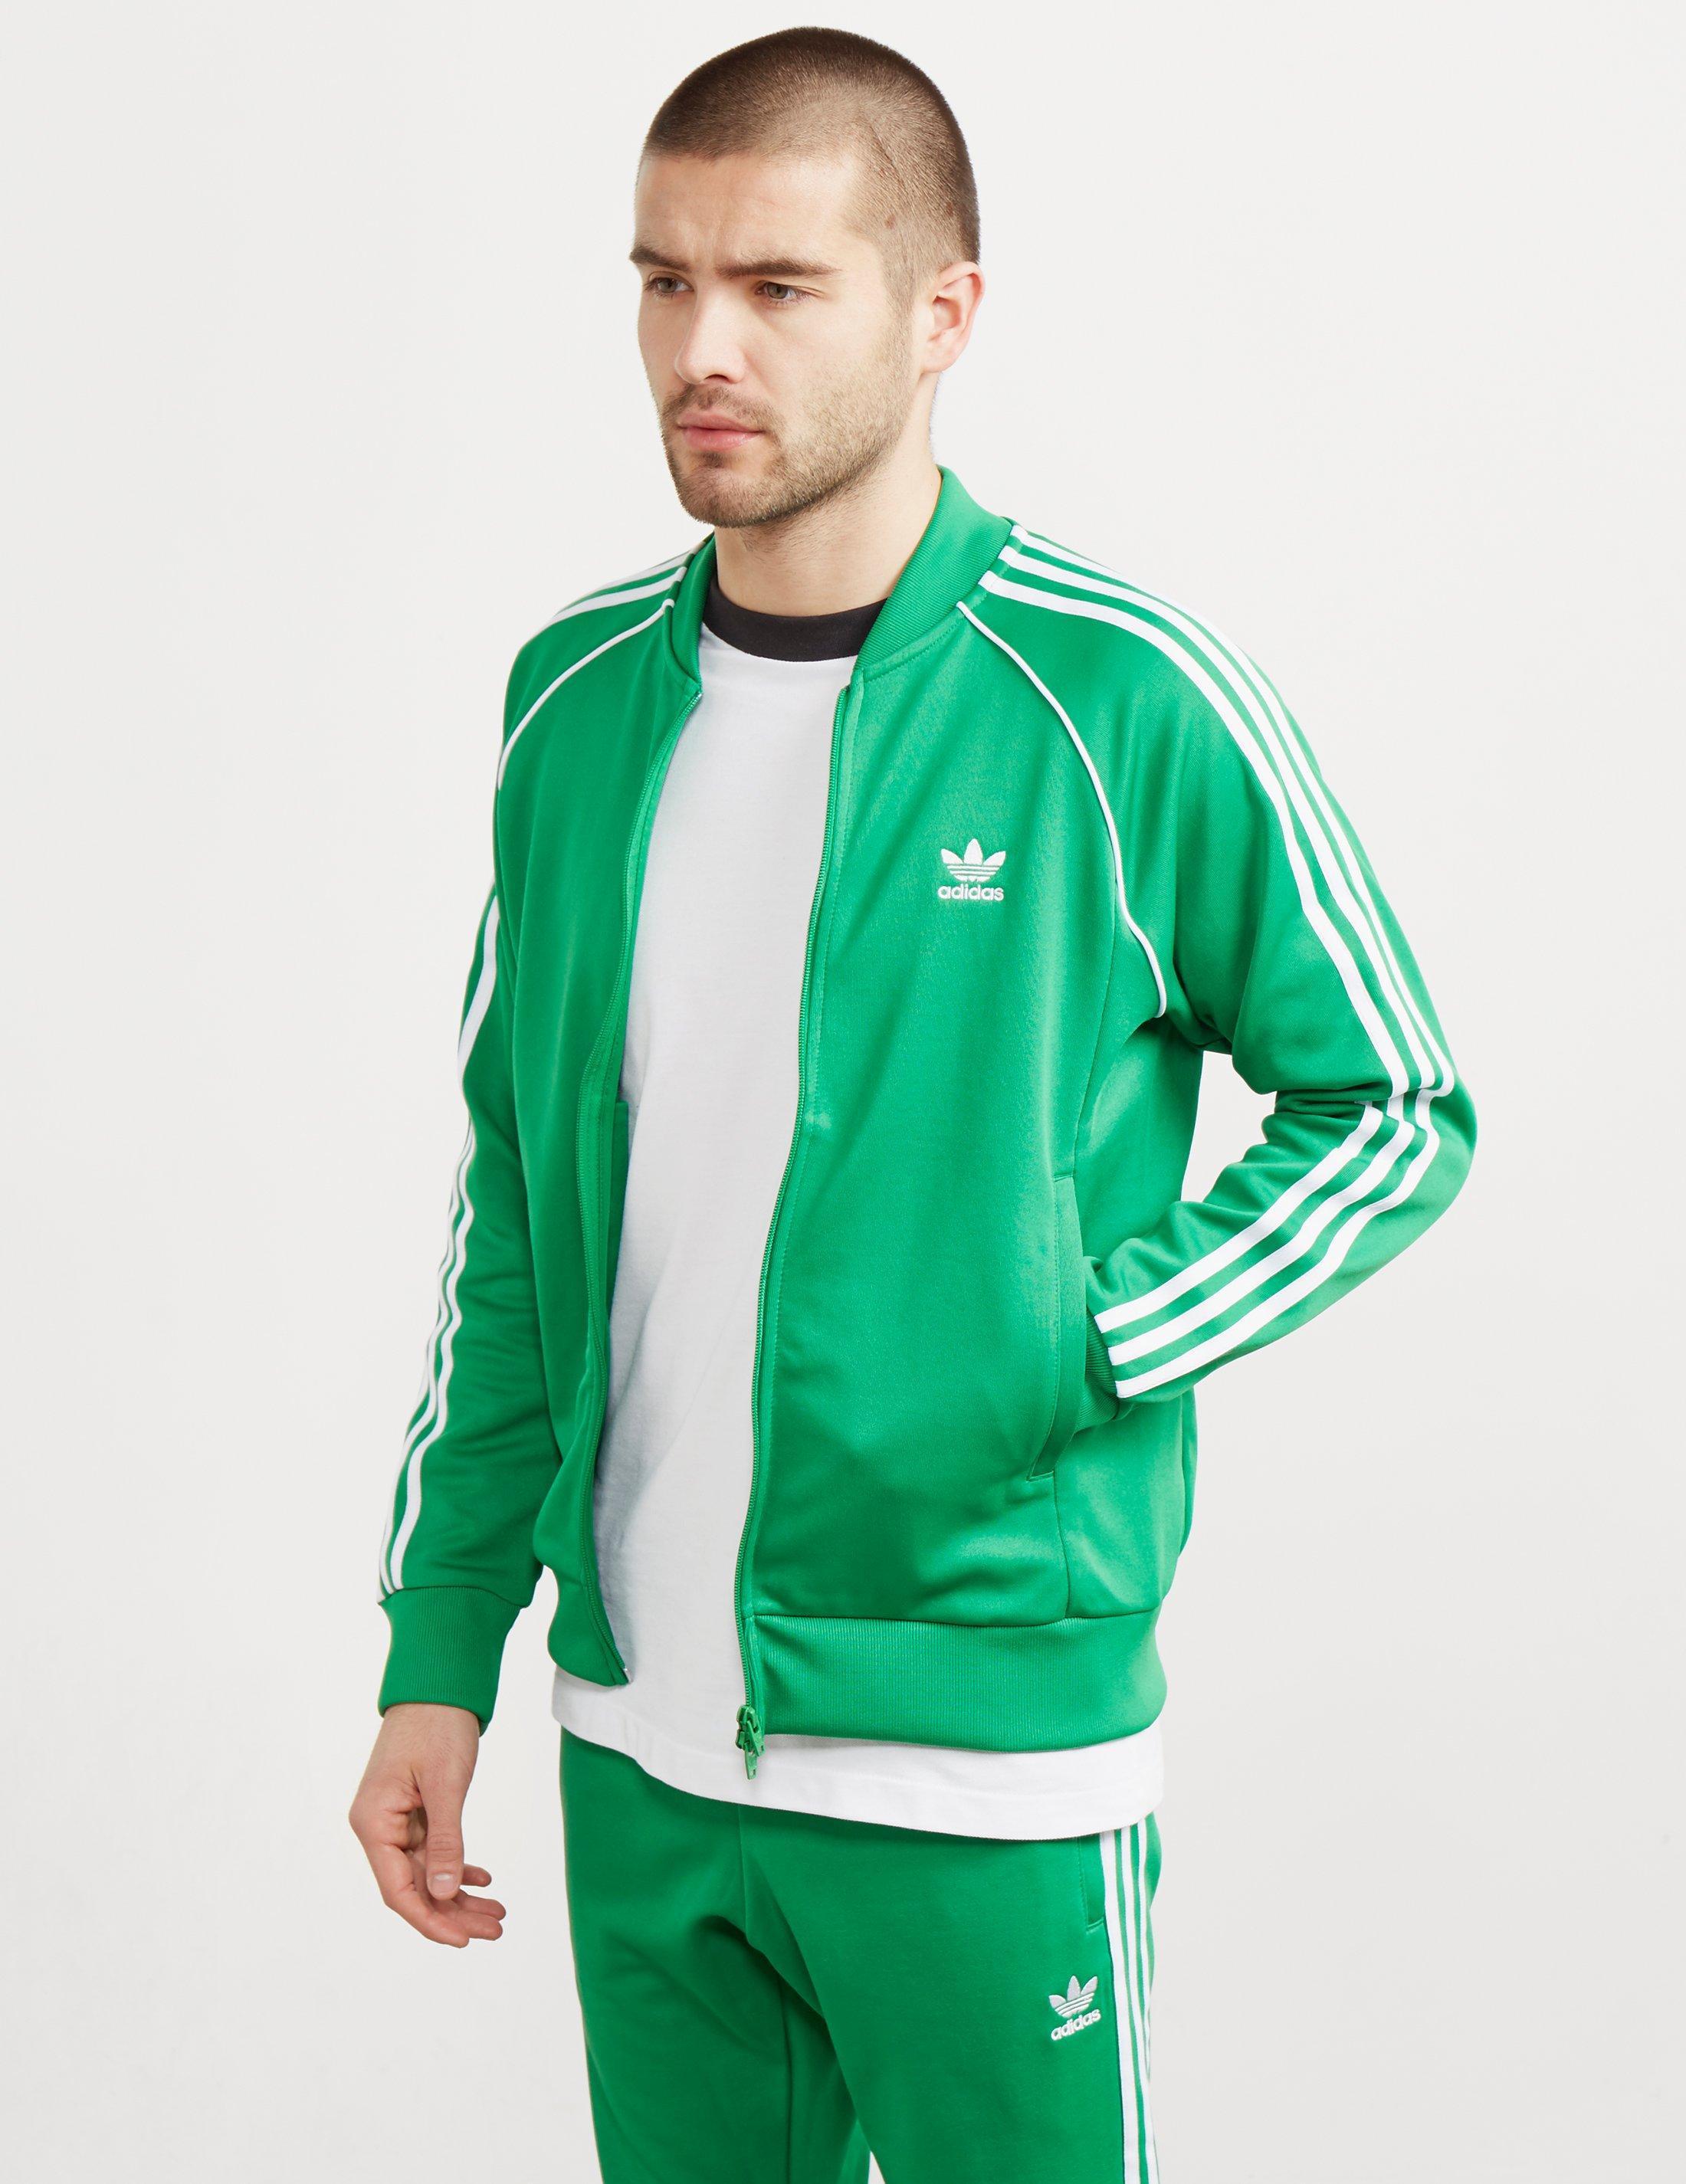 Lyst adidas originali tuta top verde per gli uomini.